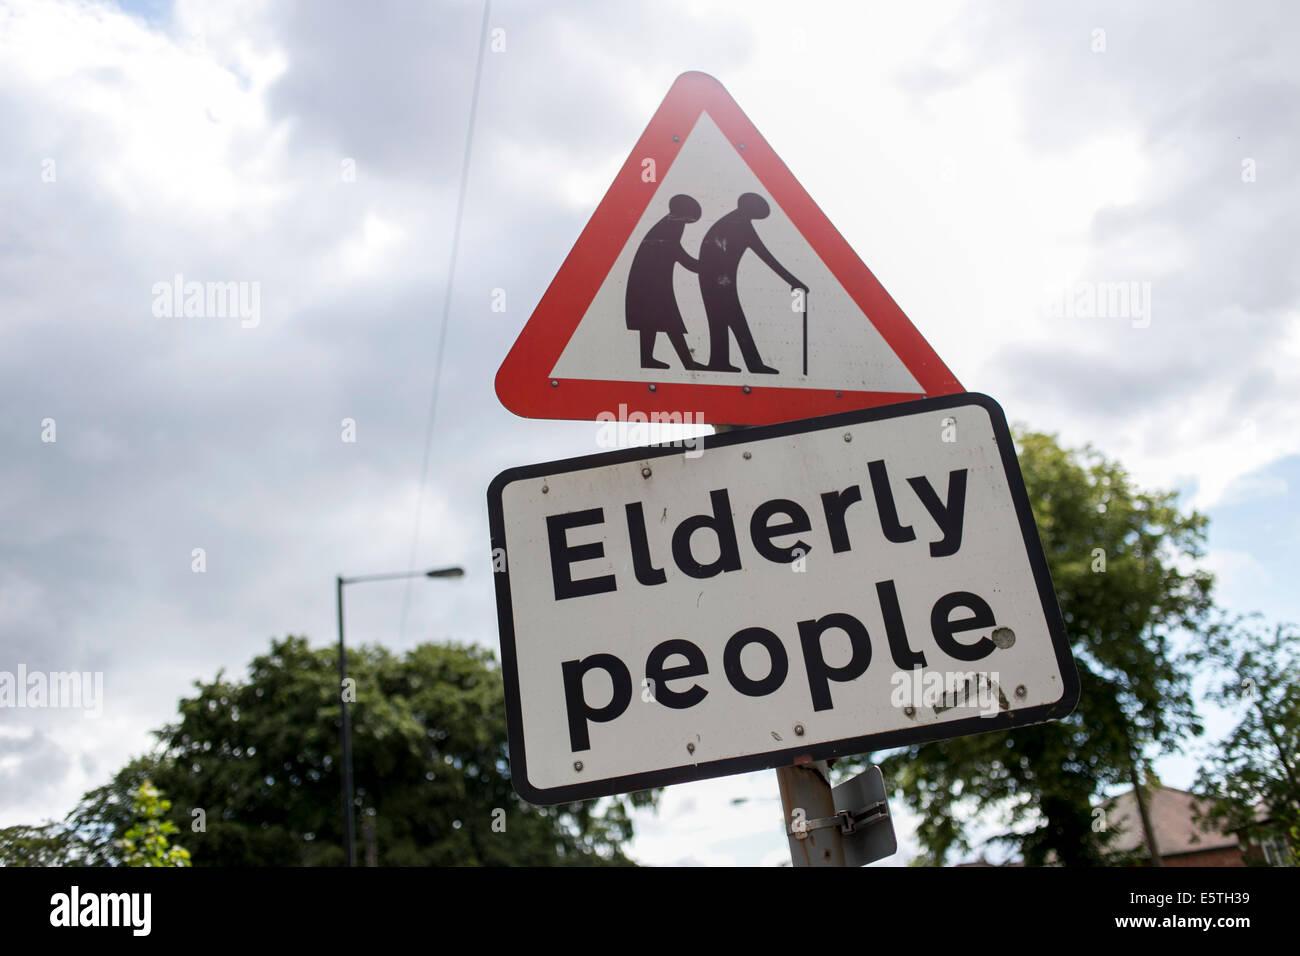 Elderly People Road Traffic Sign - Stock Image